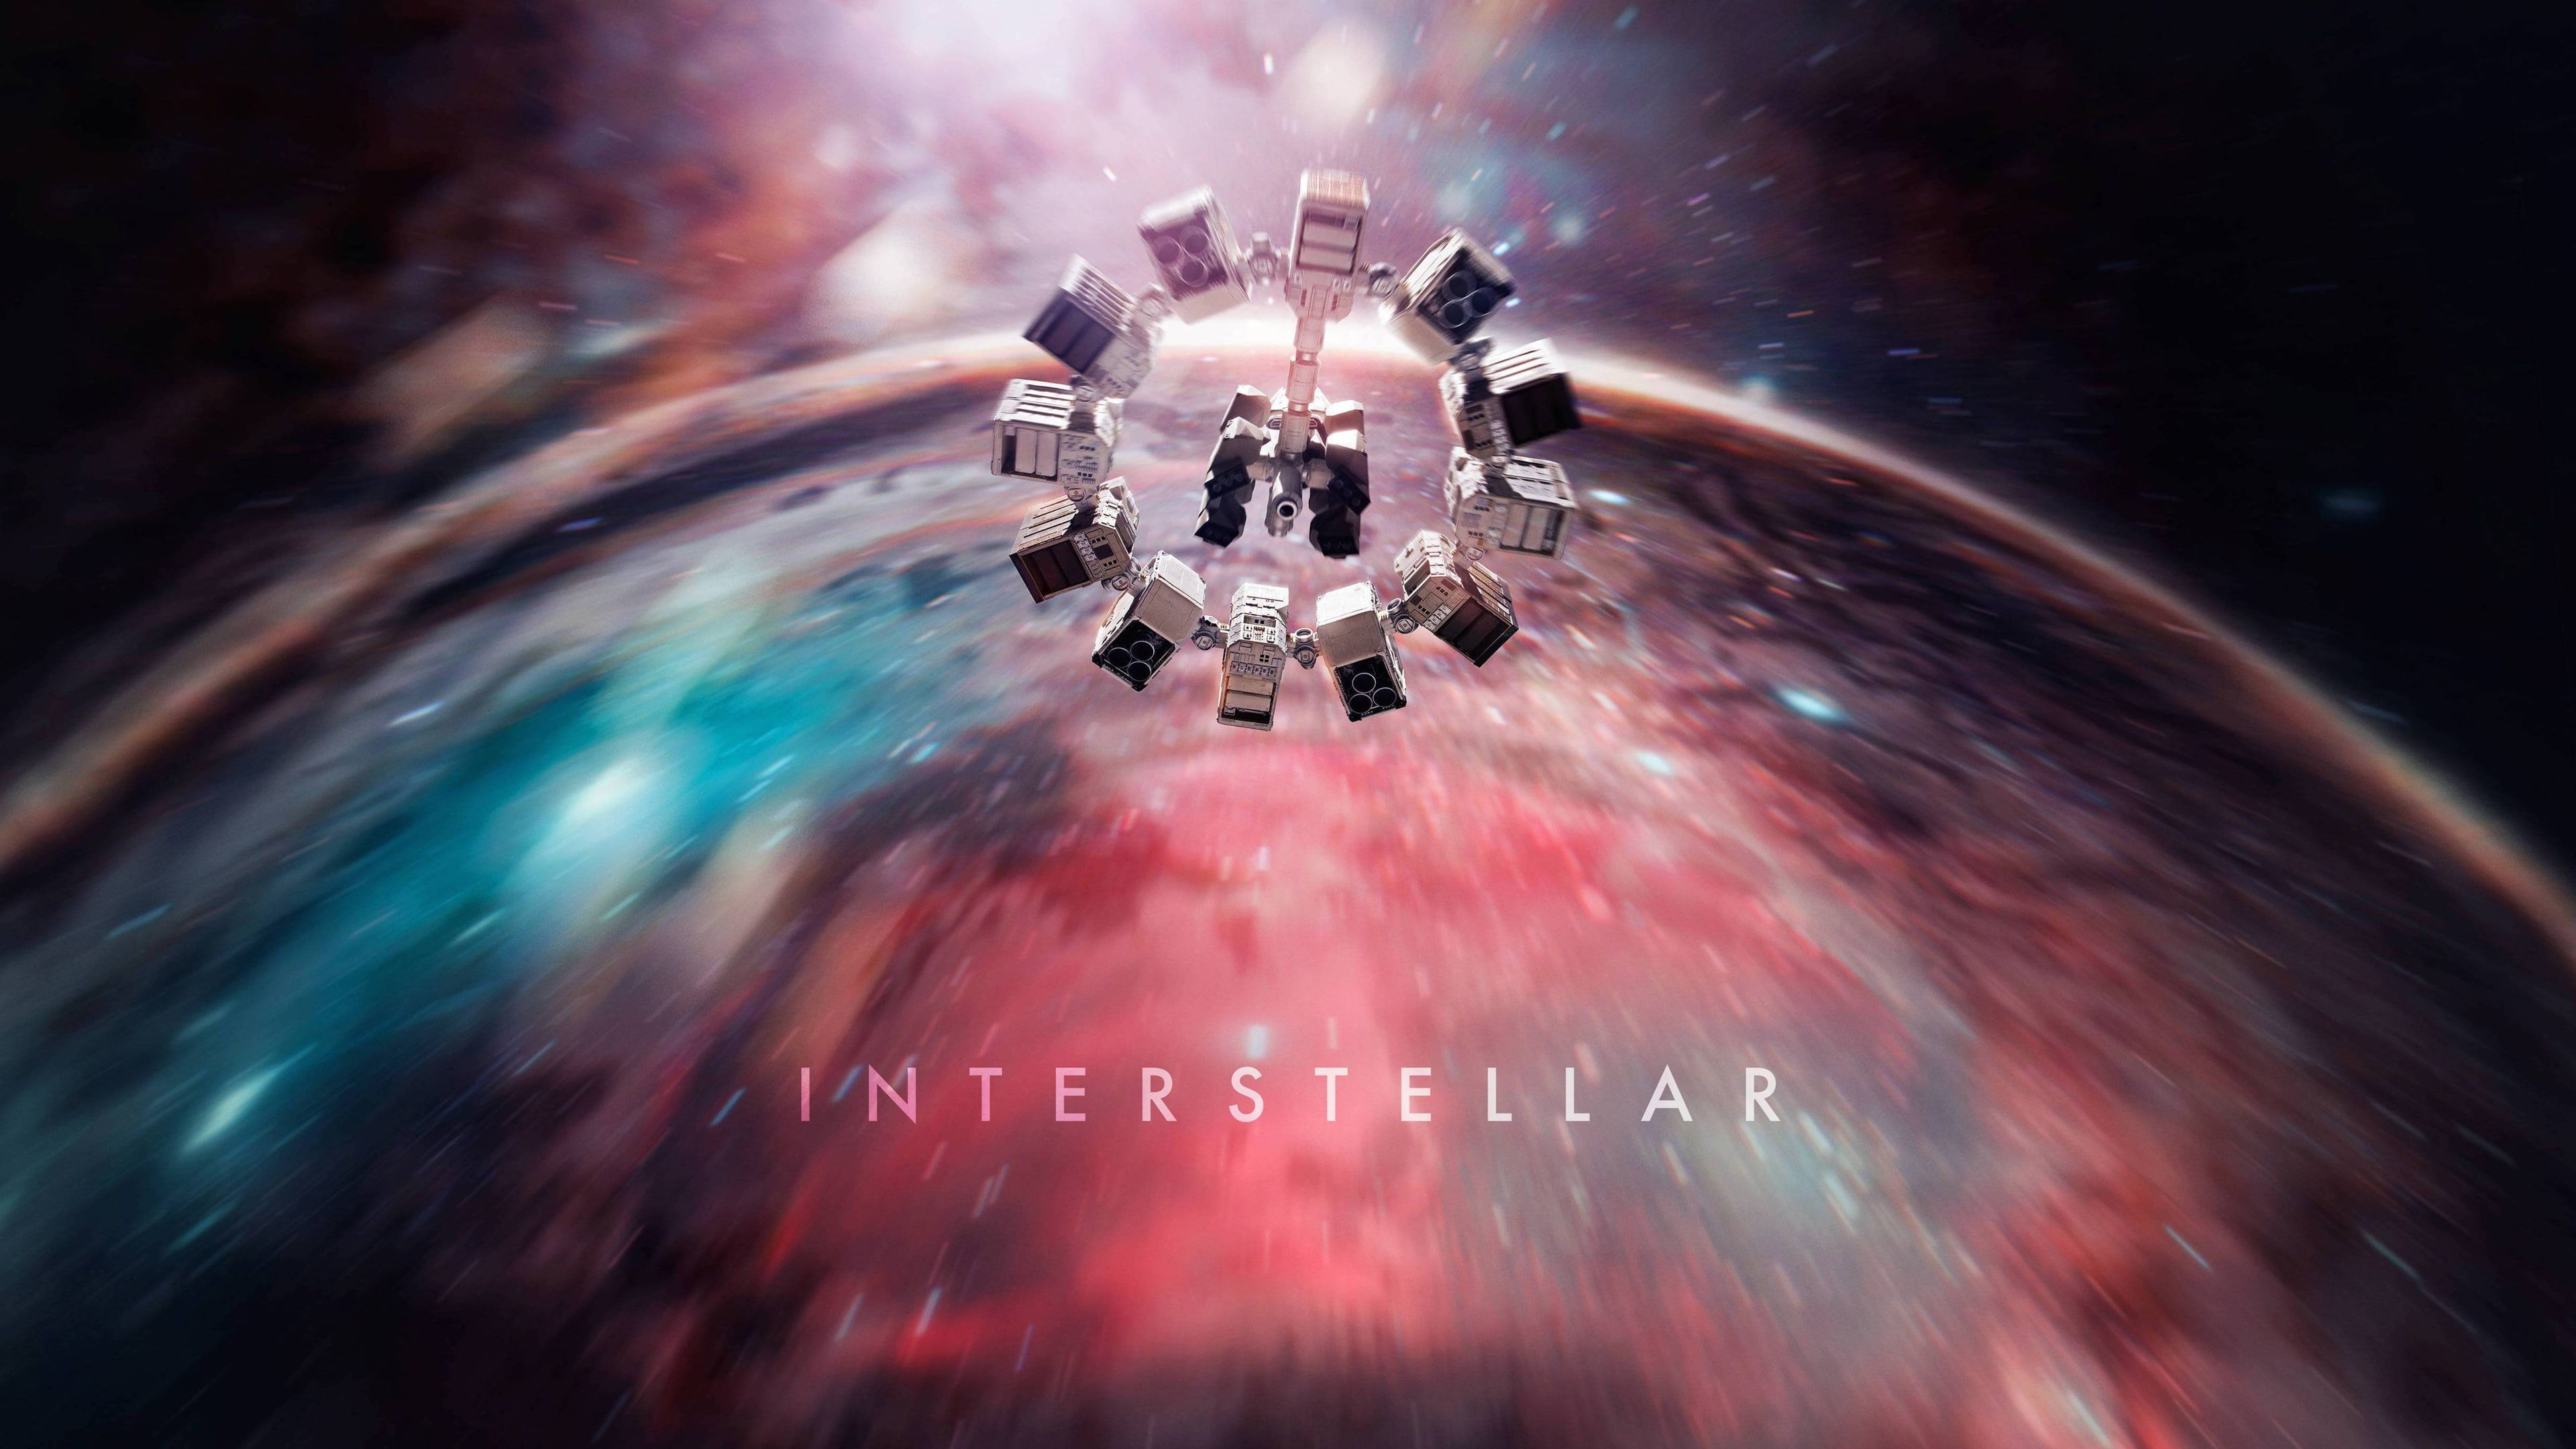 Interstellar Endurance Interstellar Endurance 4k Wallpaper Hdwallpaper Desktop In 2020 Interstellar Movie Posters Interstellar Movie